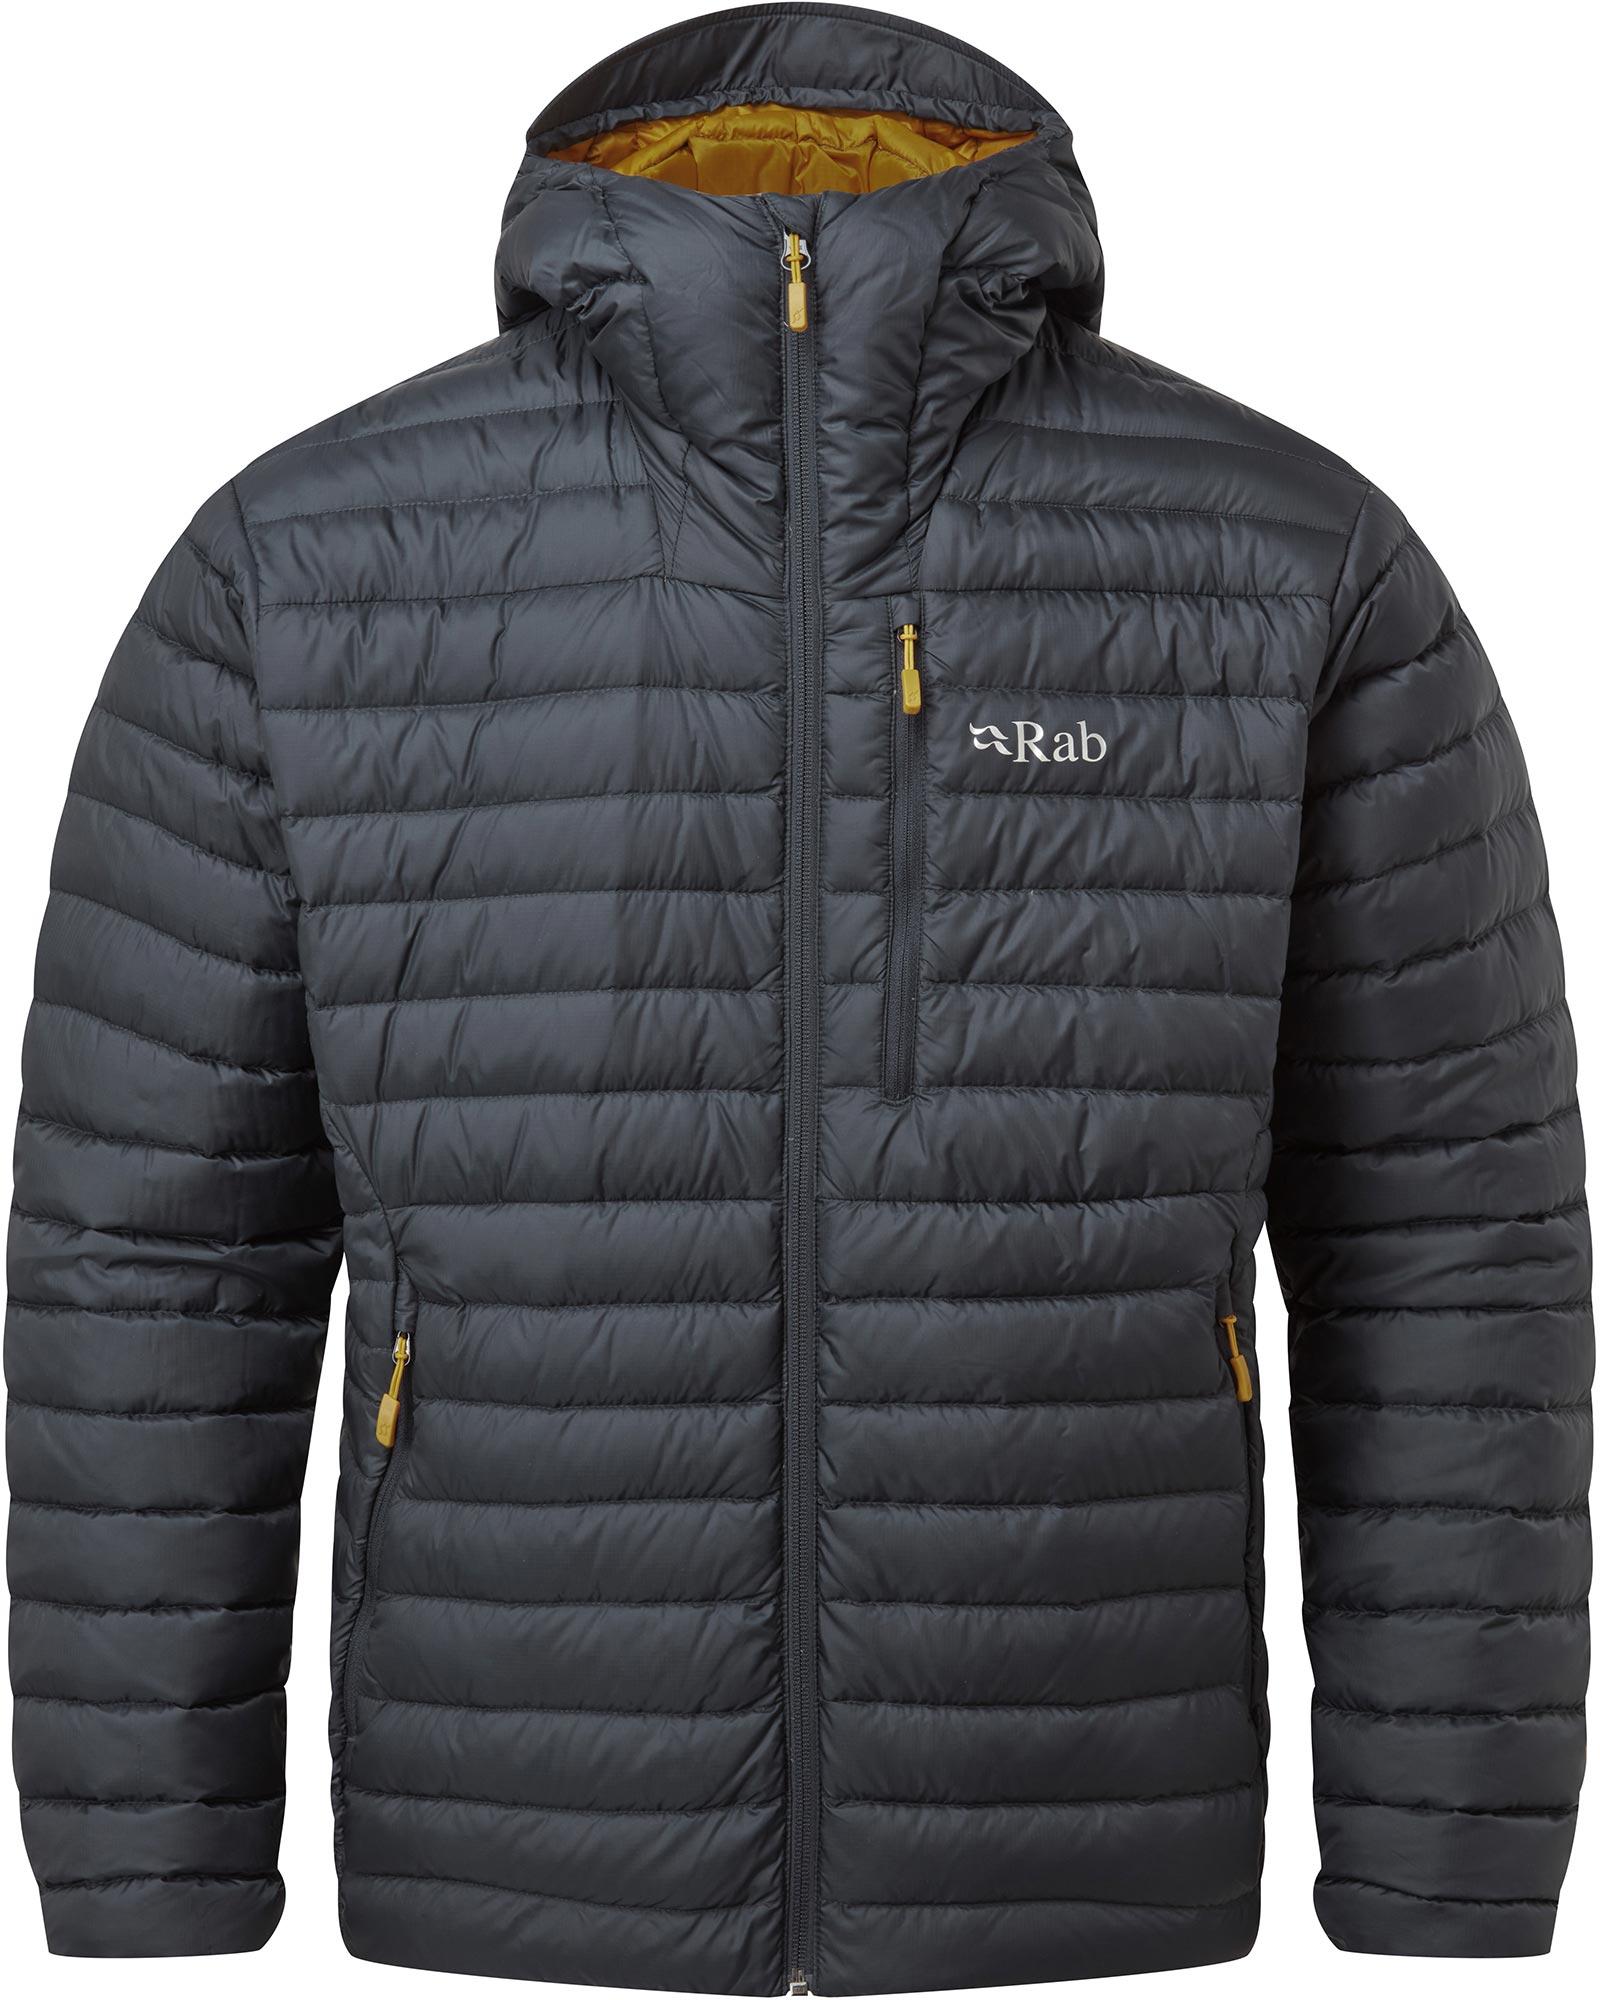 Rab Men's Microlight Alpine Jacket 0